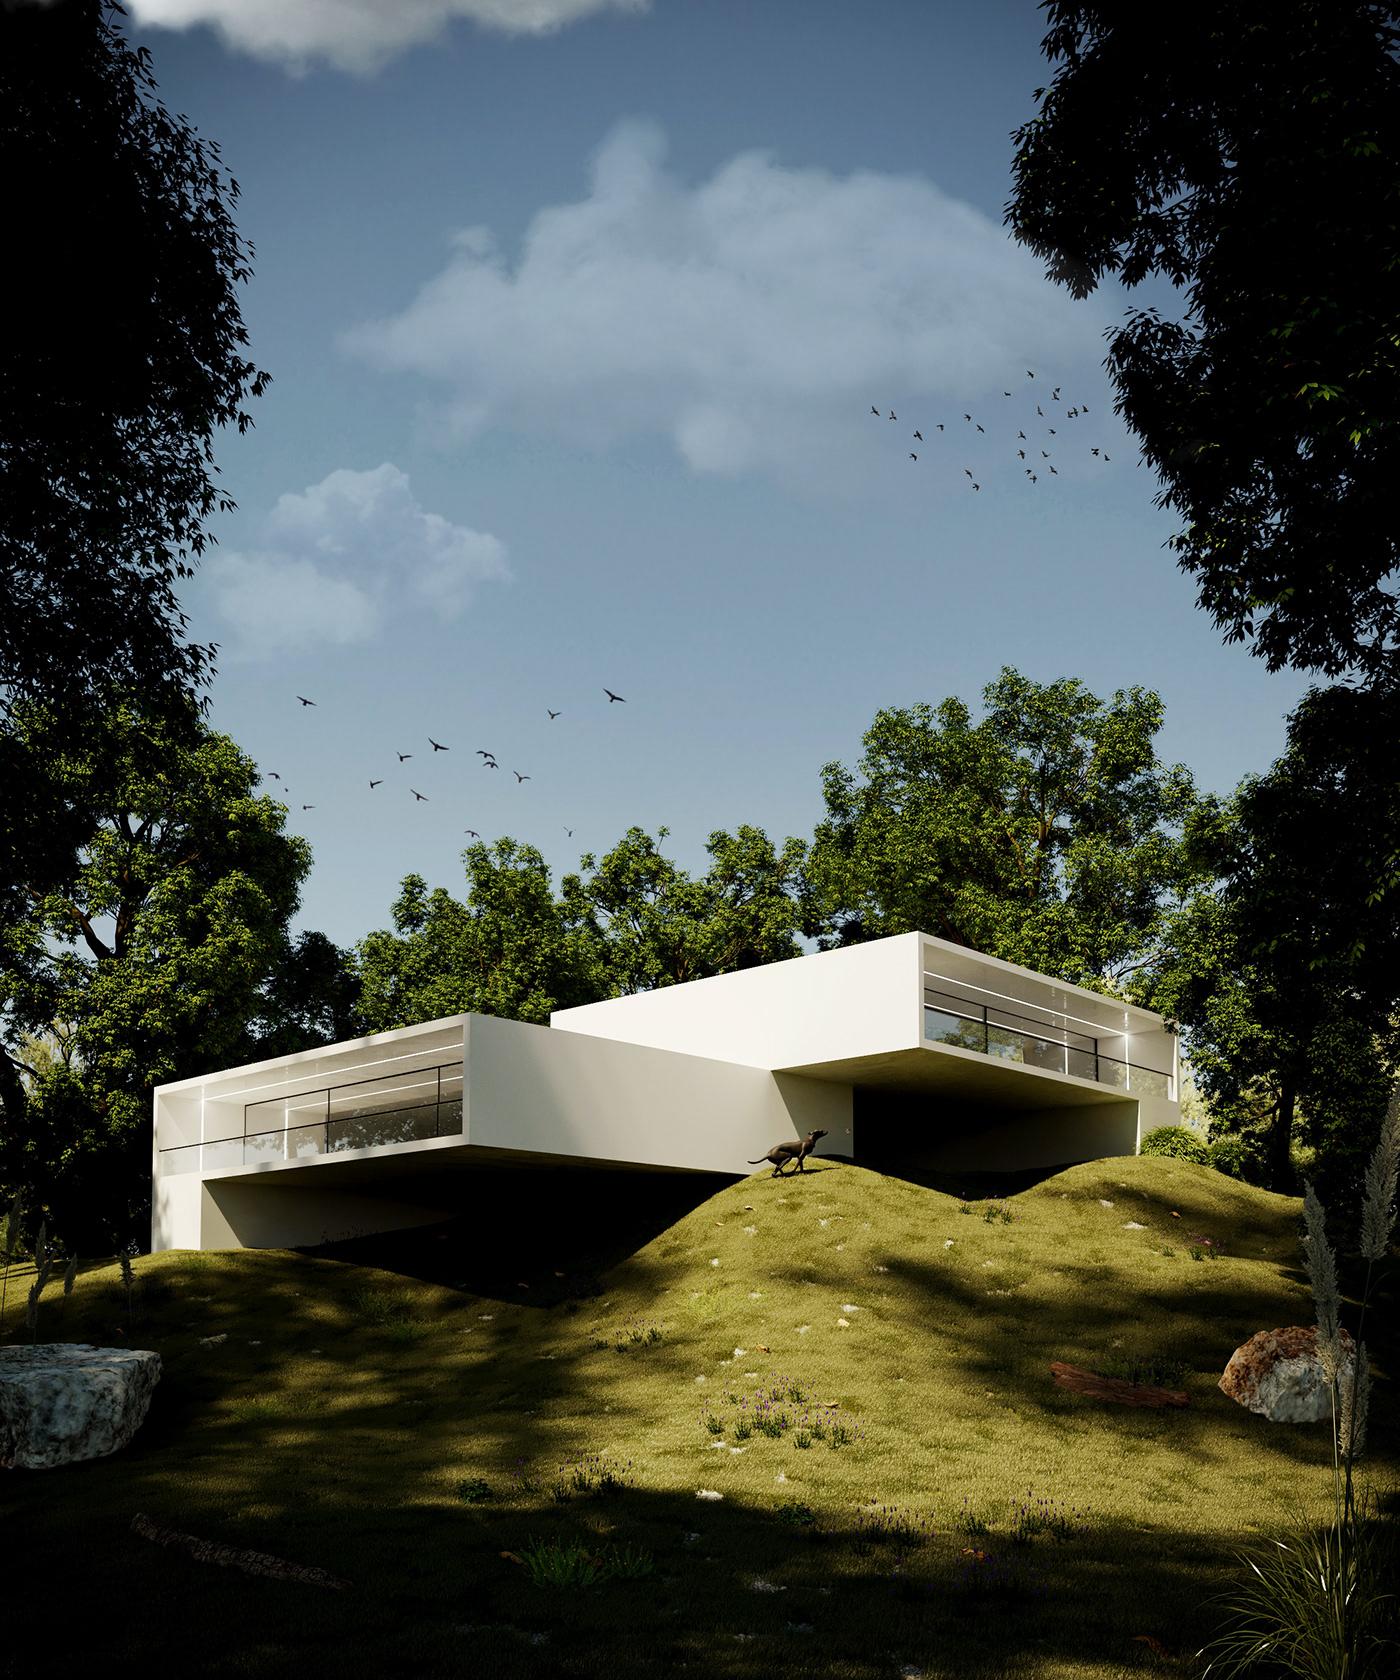 3D Archiv arquitectura cinema4d CoronaRender  diseño forest house Render Tree